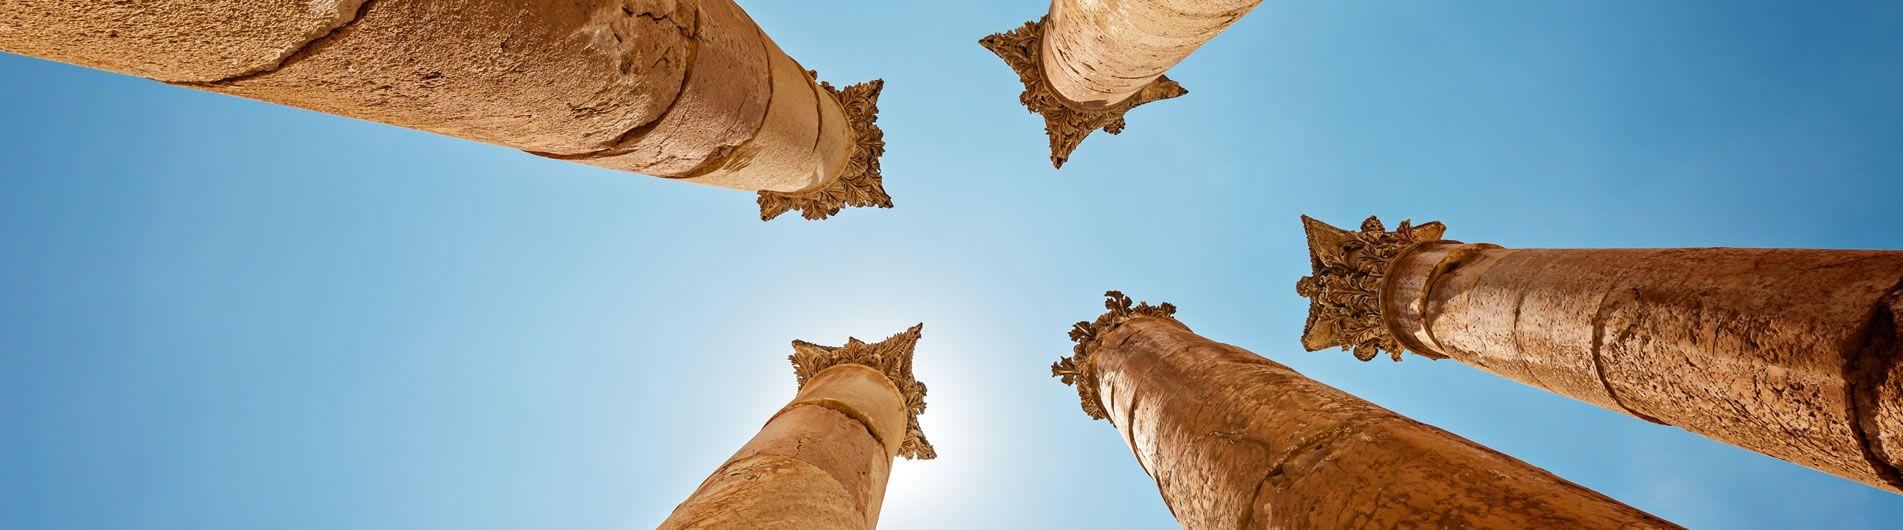 Jerash, Ancient Roman City